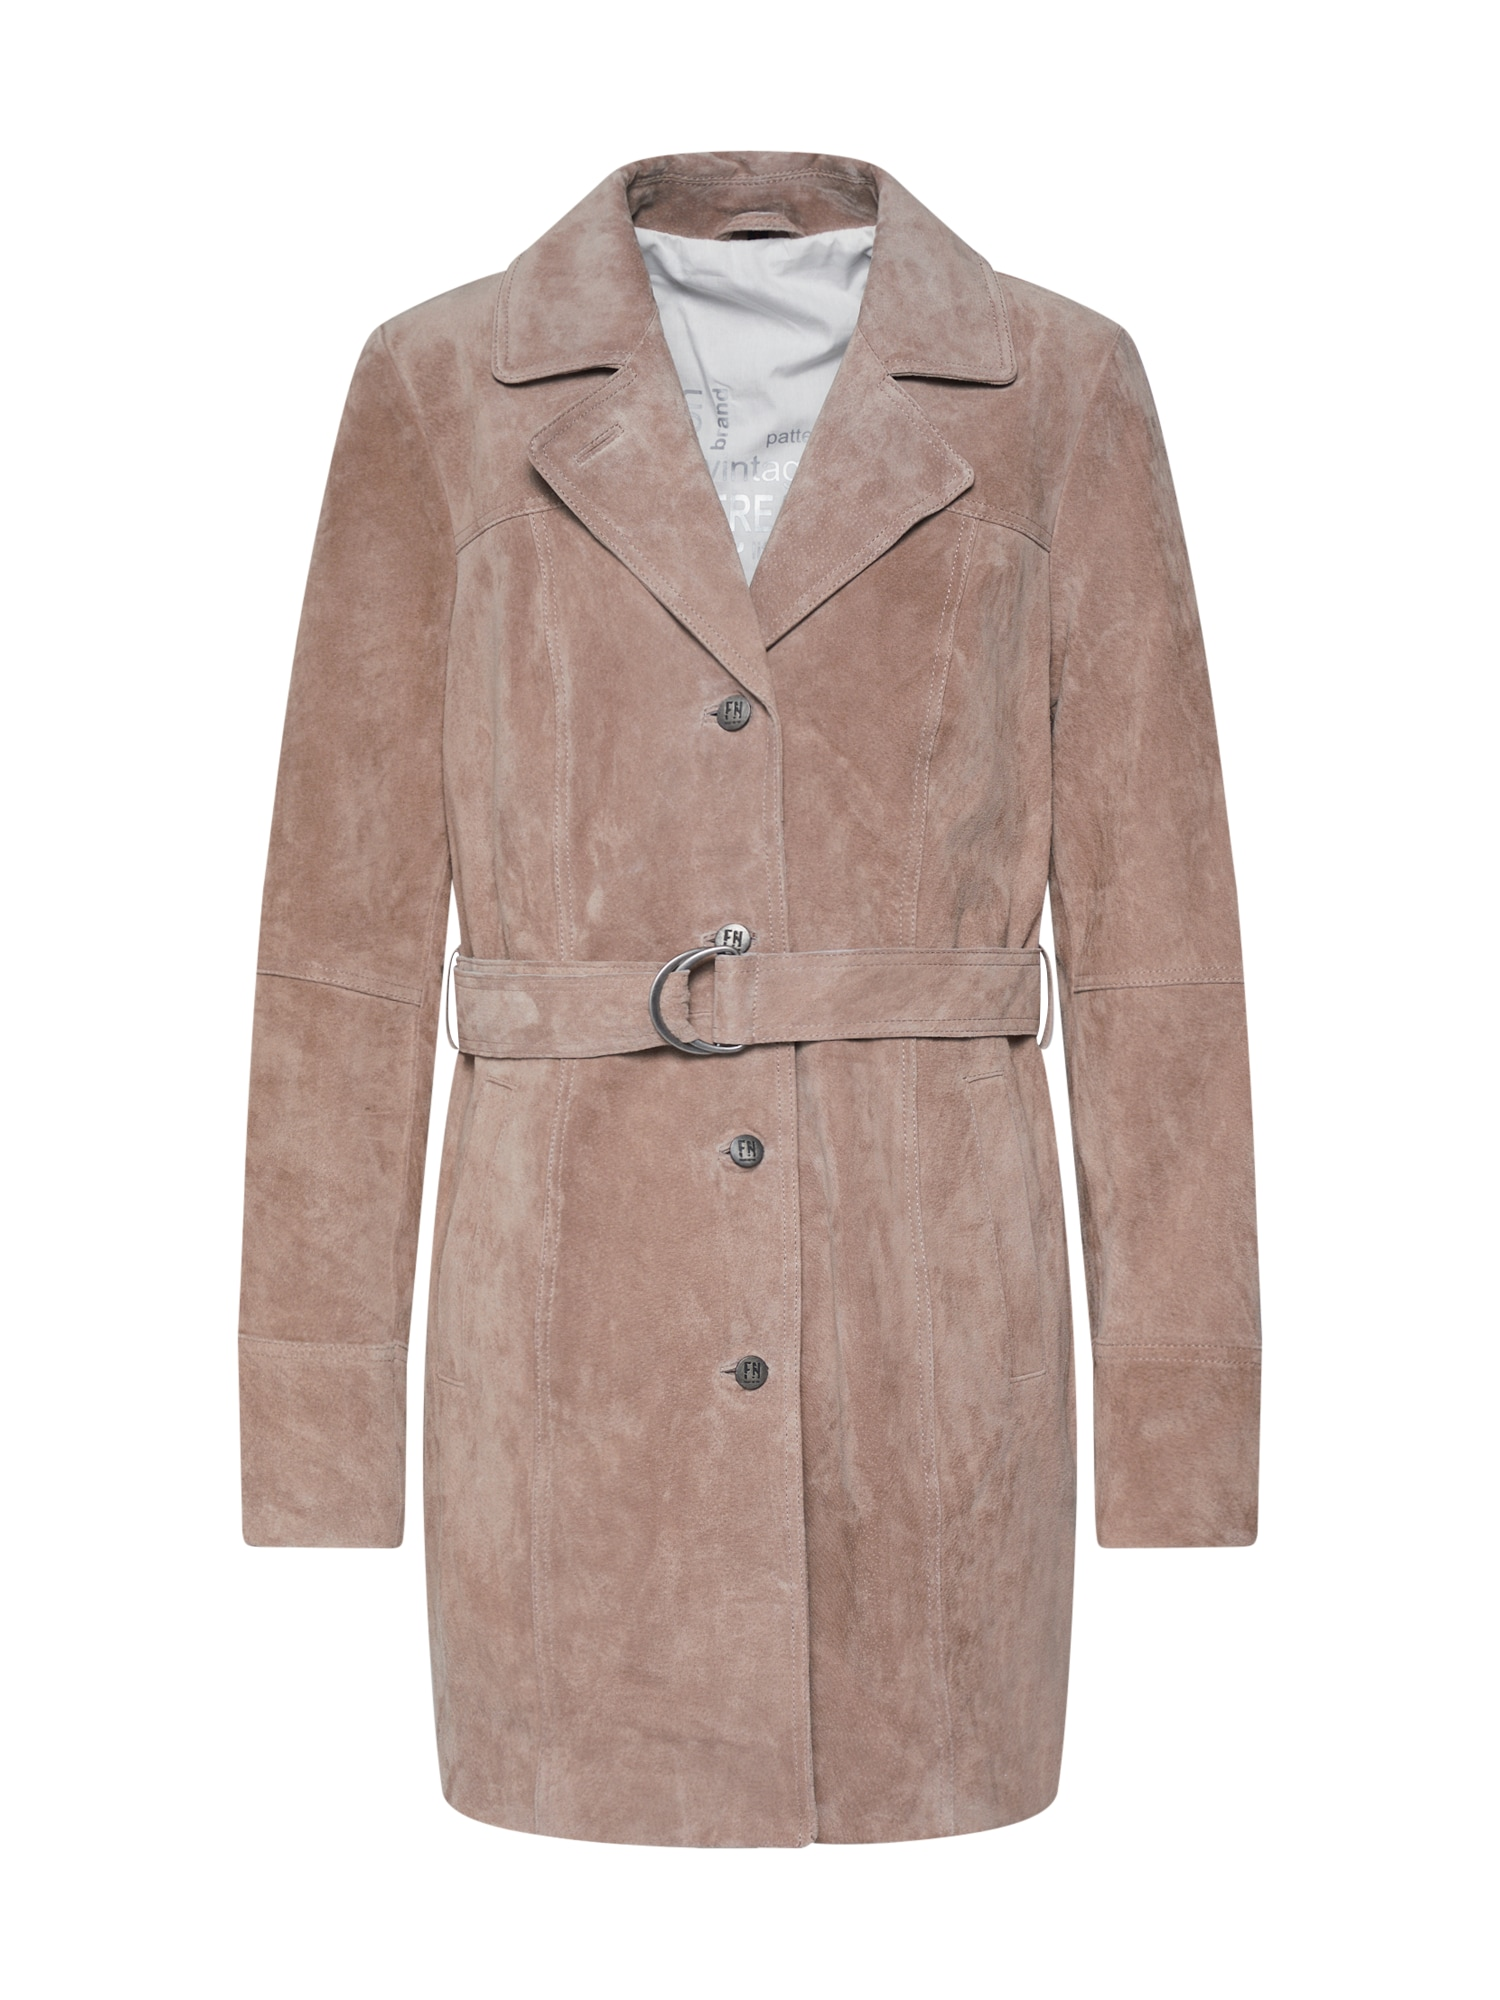 FREAKY NATION Rudeninis-žieminis paltas 'Annouk' gelsvai pilka spalva